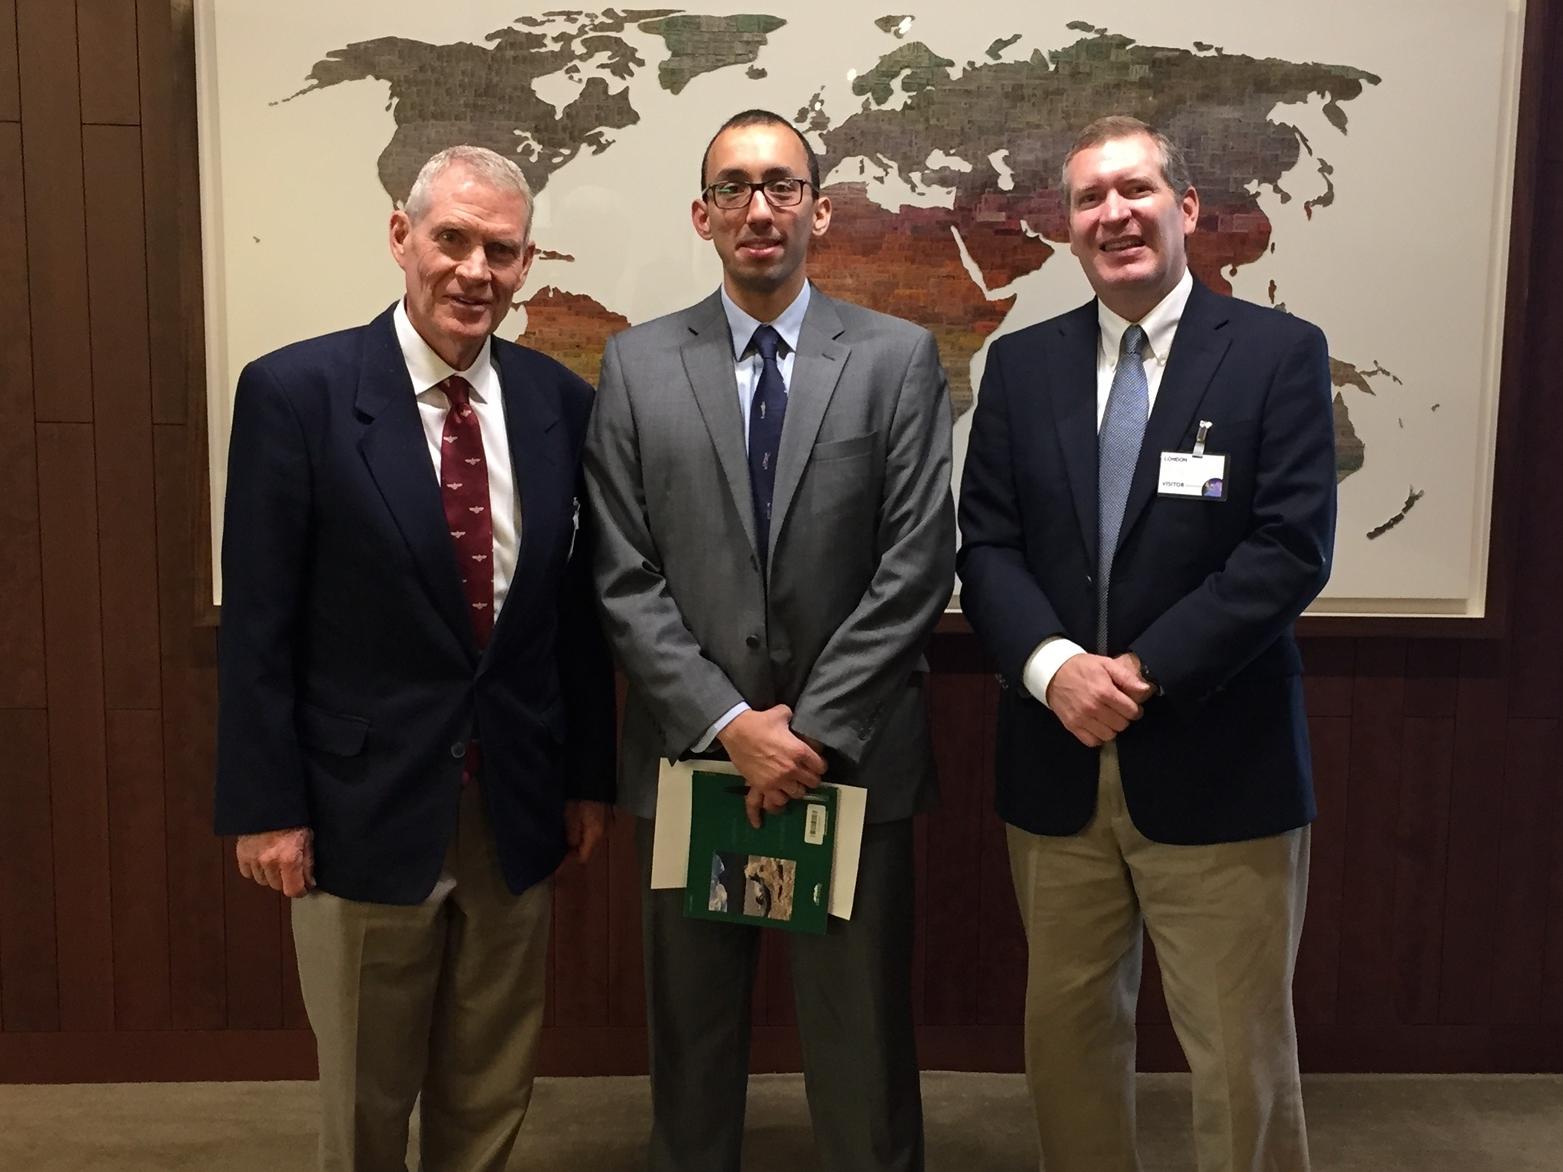 Larry Lunt, Karim Chedid, and John Lunt